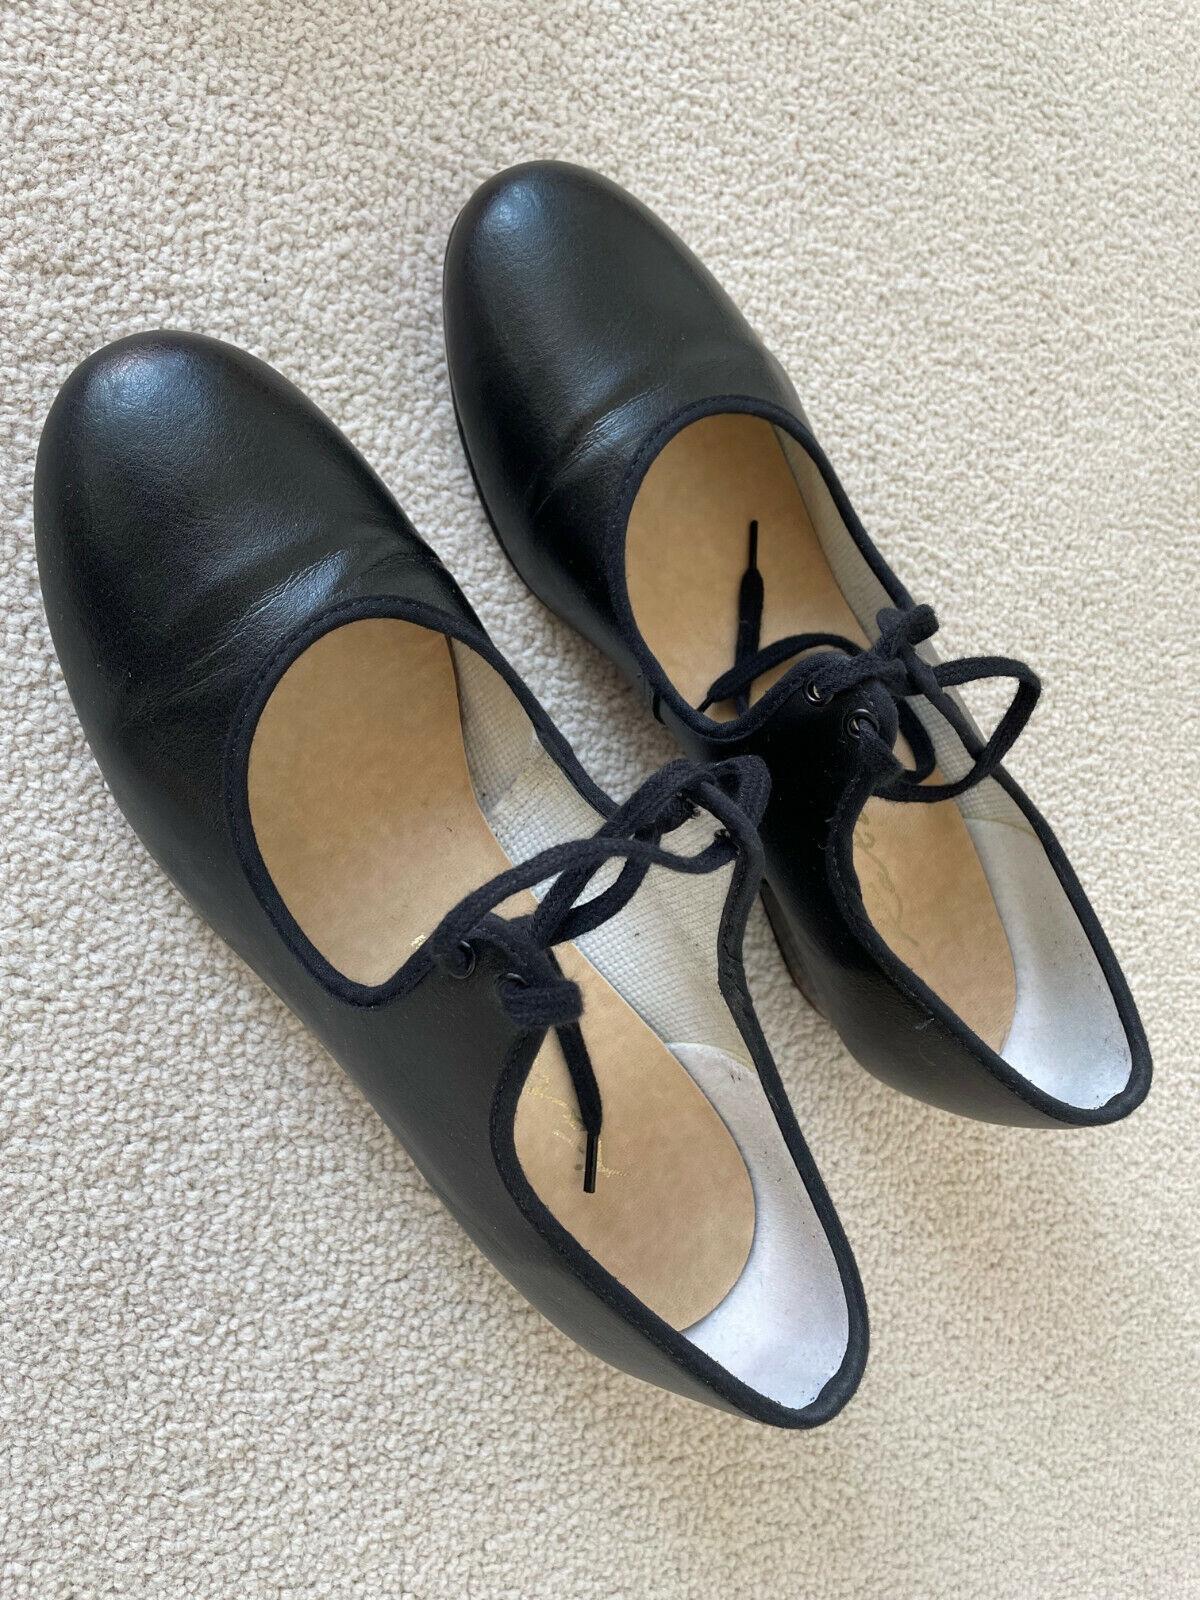 Katz Low Heel Tap Shoes - Size 6 - Black *VGC!*